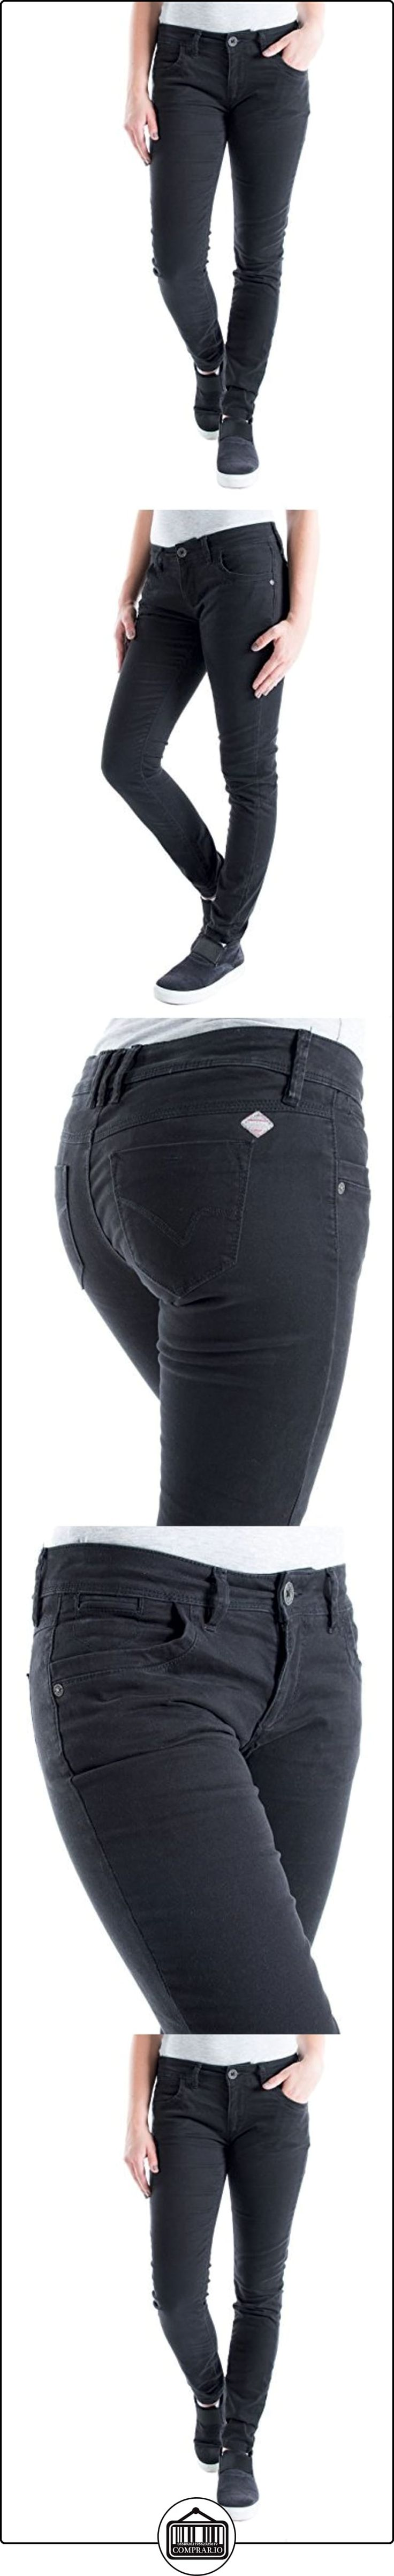 Timezone Aureliatz 5-Pocket Pants, Pantalones para Mujer, Gris Oscuro, W25  ✿ Vaqueros ✿